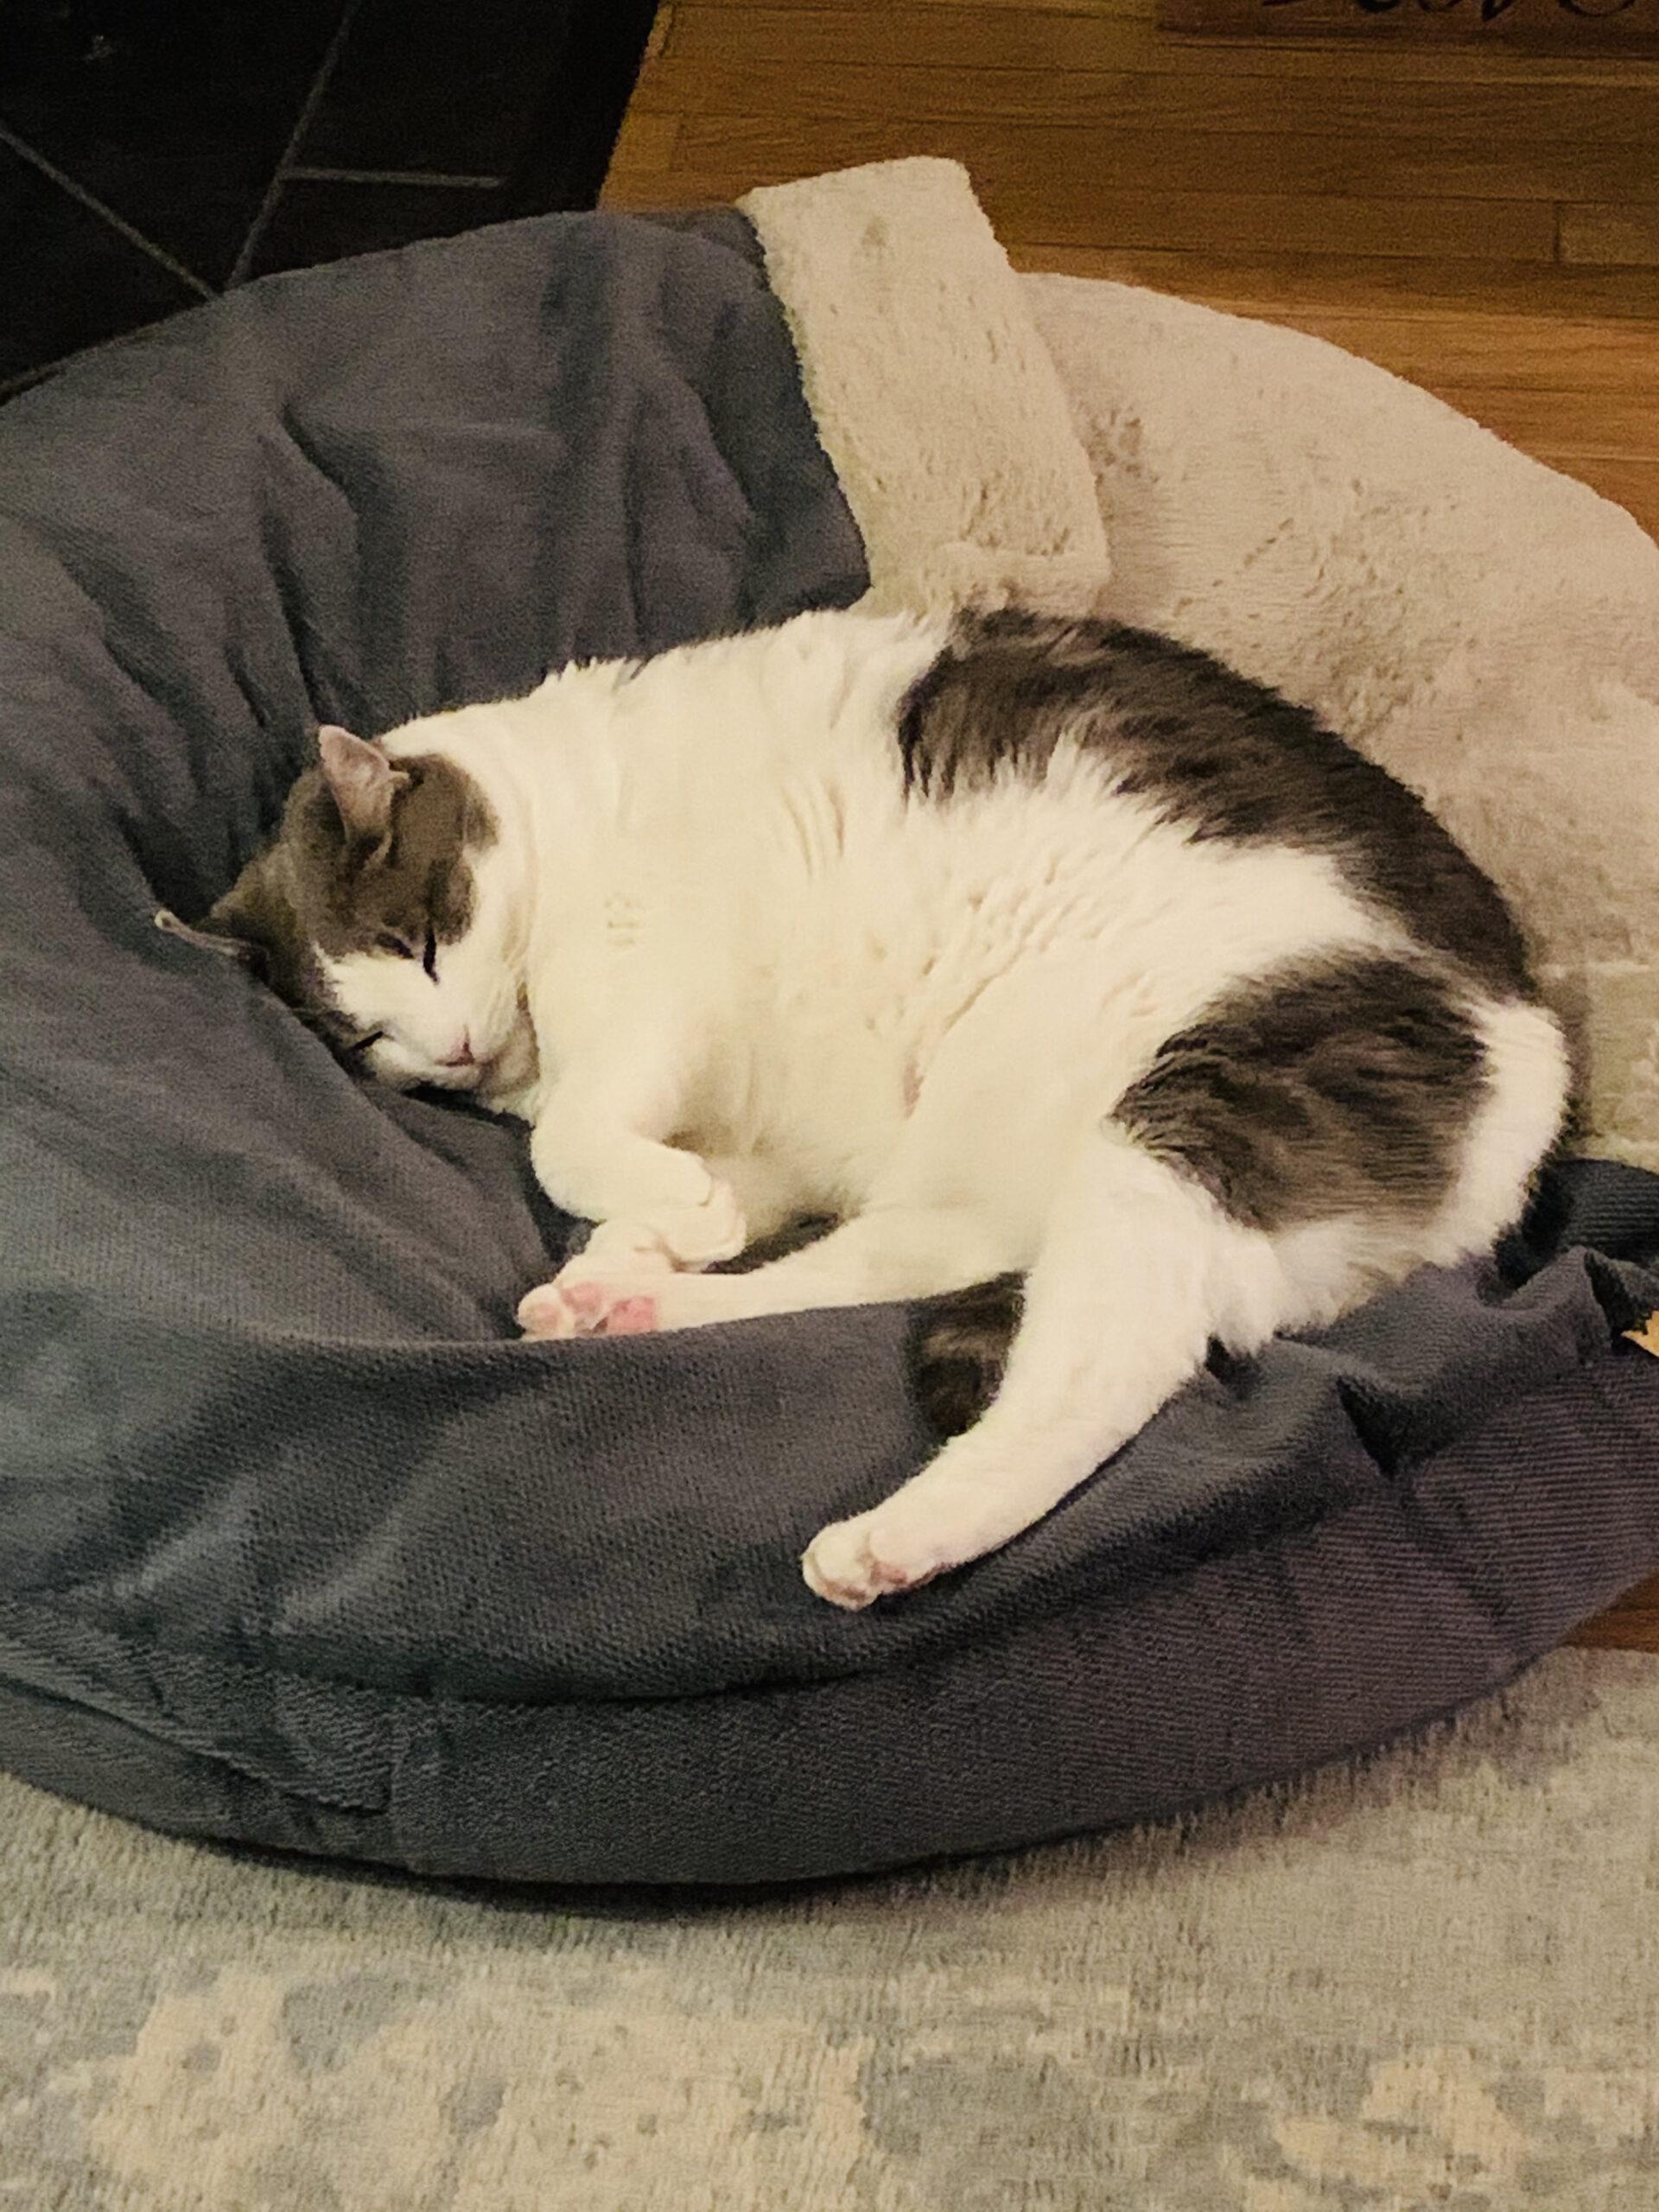 Otis on the dog bed